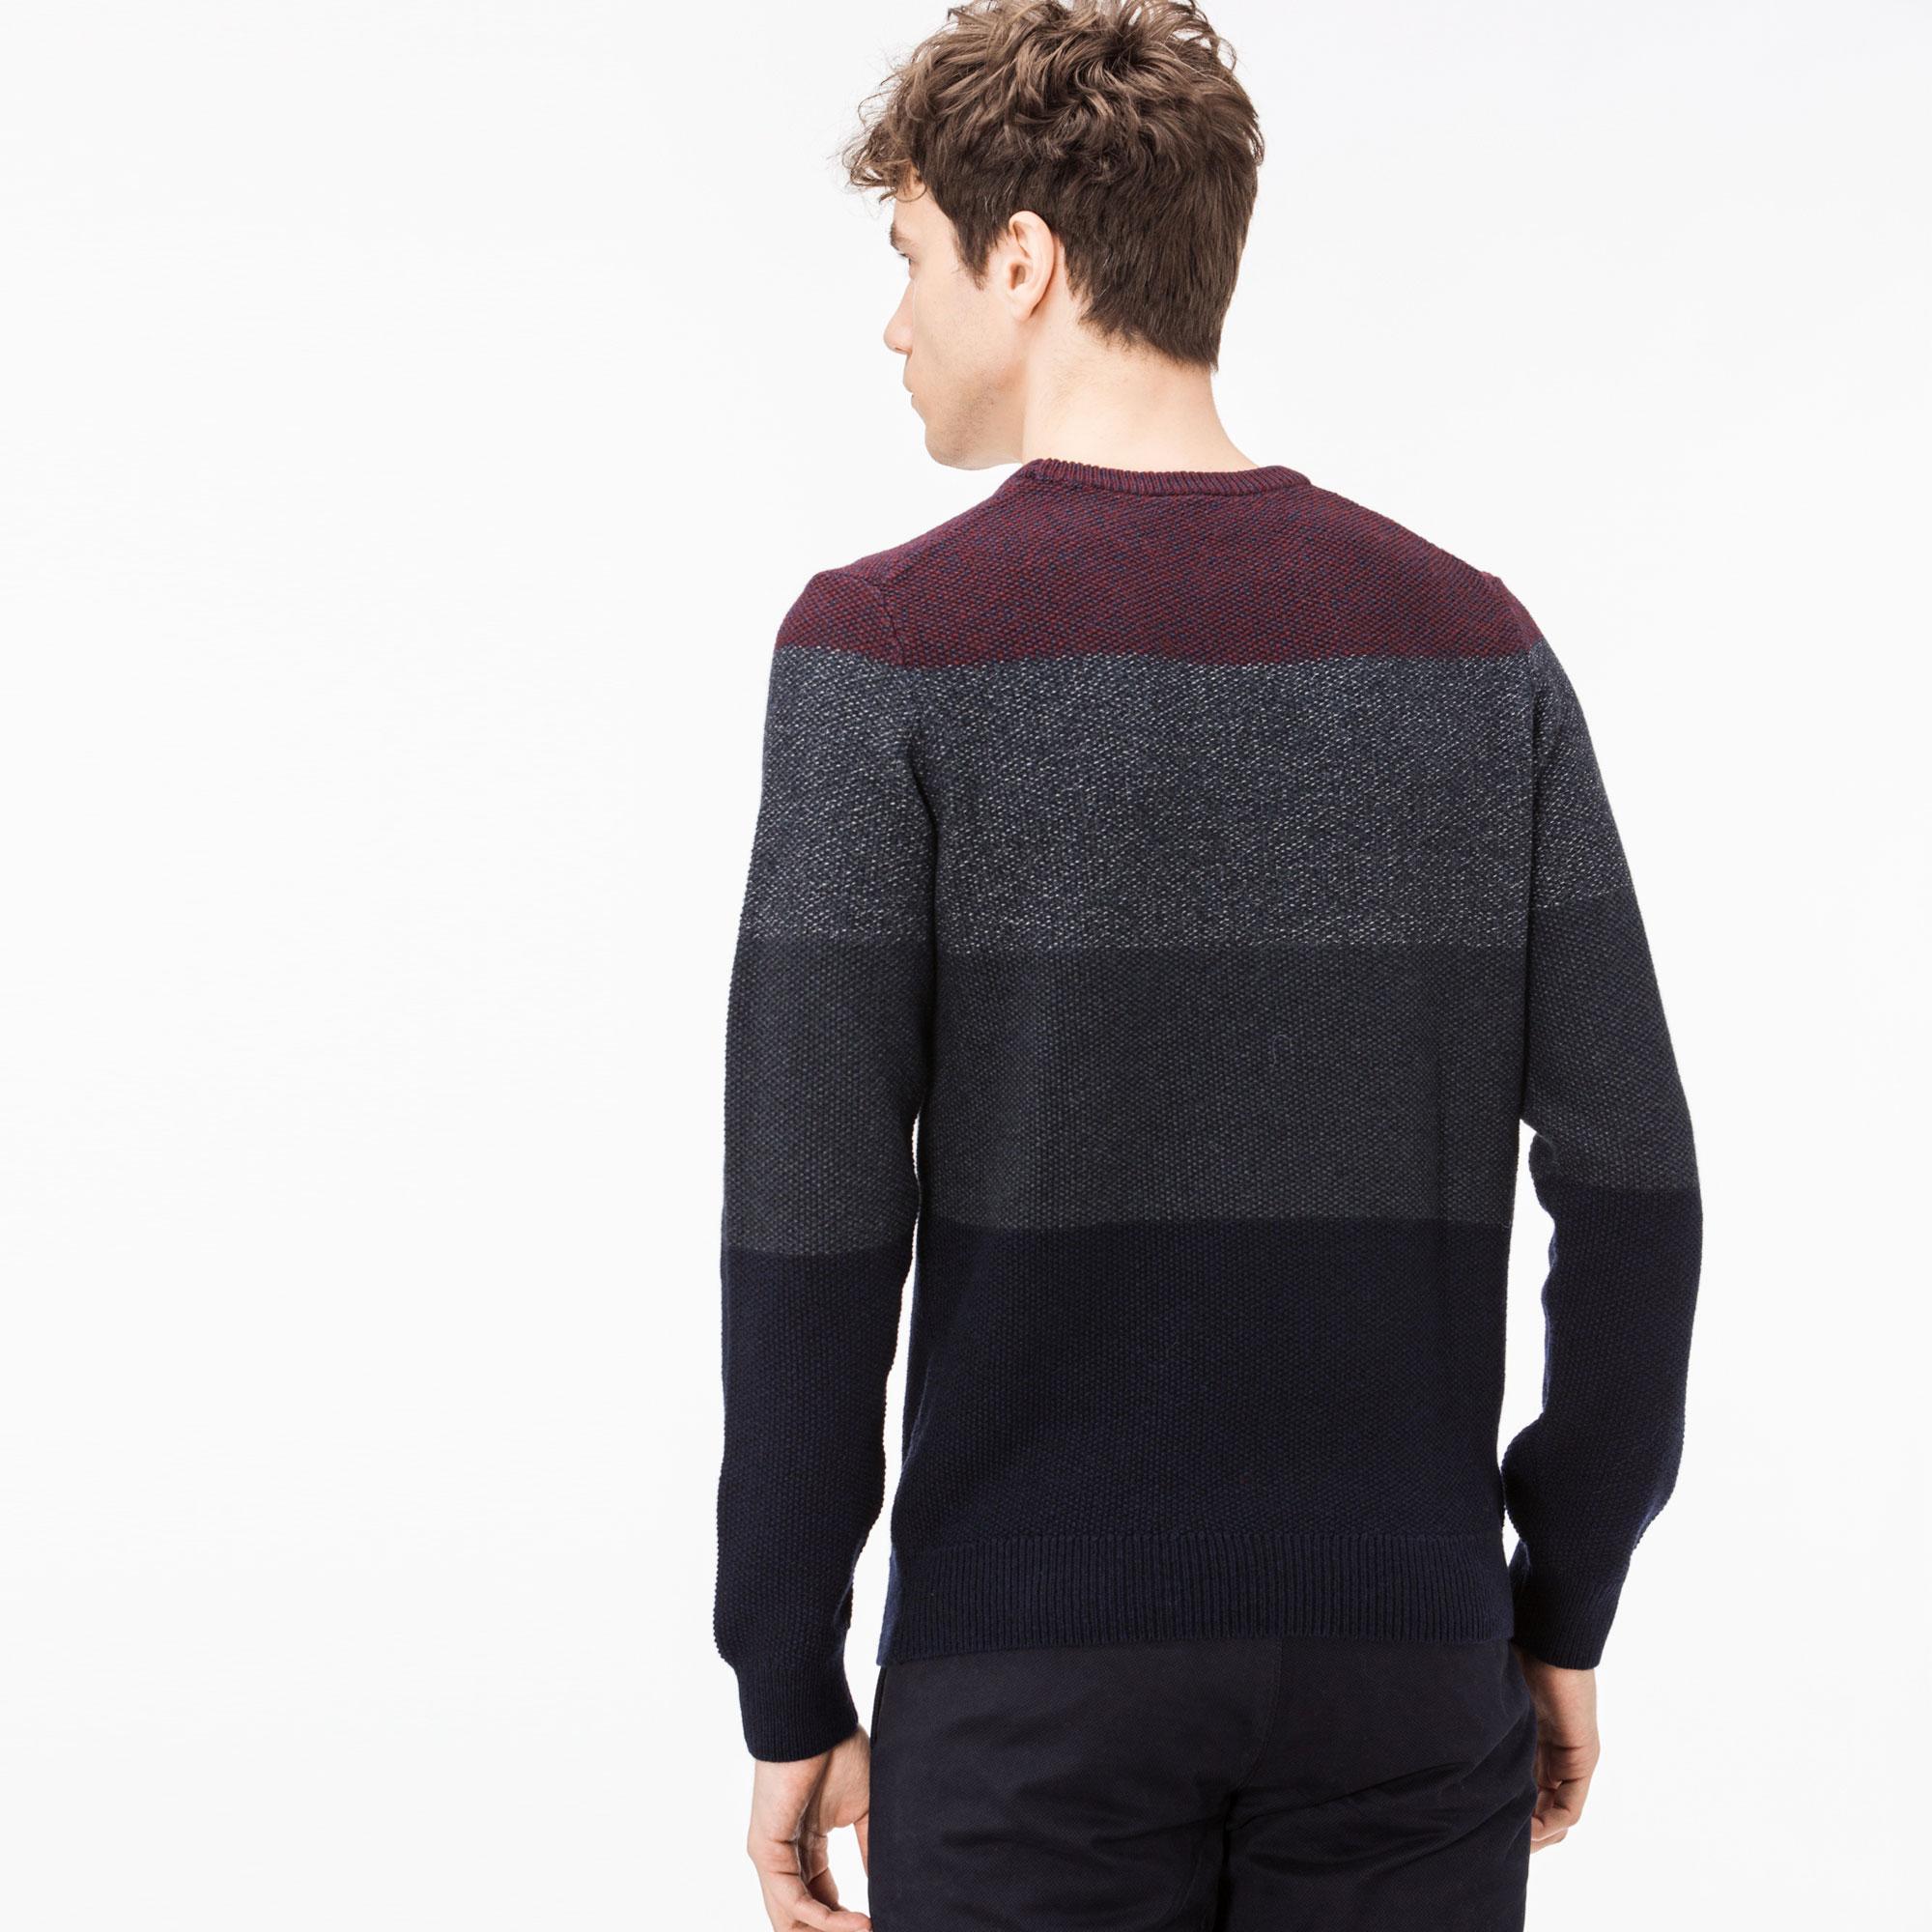 Фото 4 - Мужской свитер Lacoste темно-синего цвета